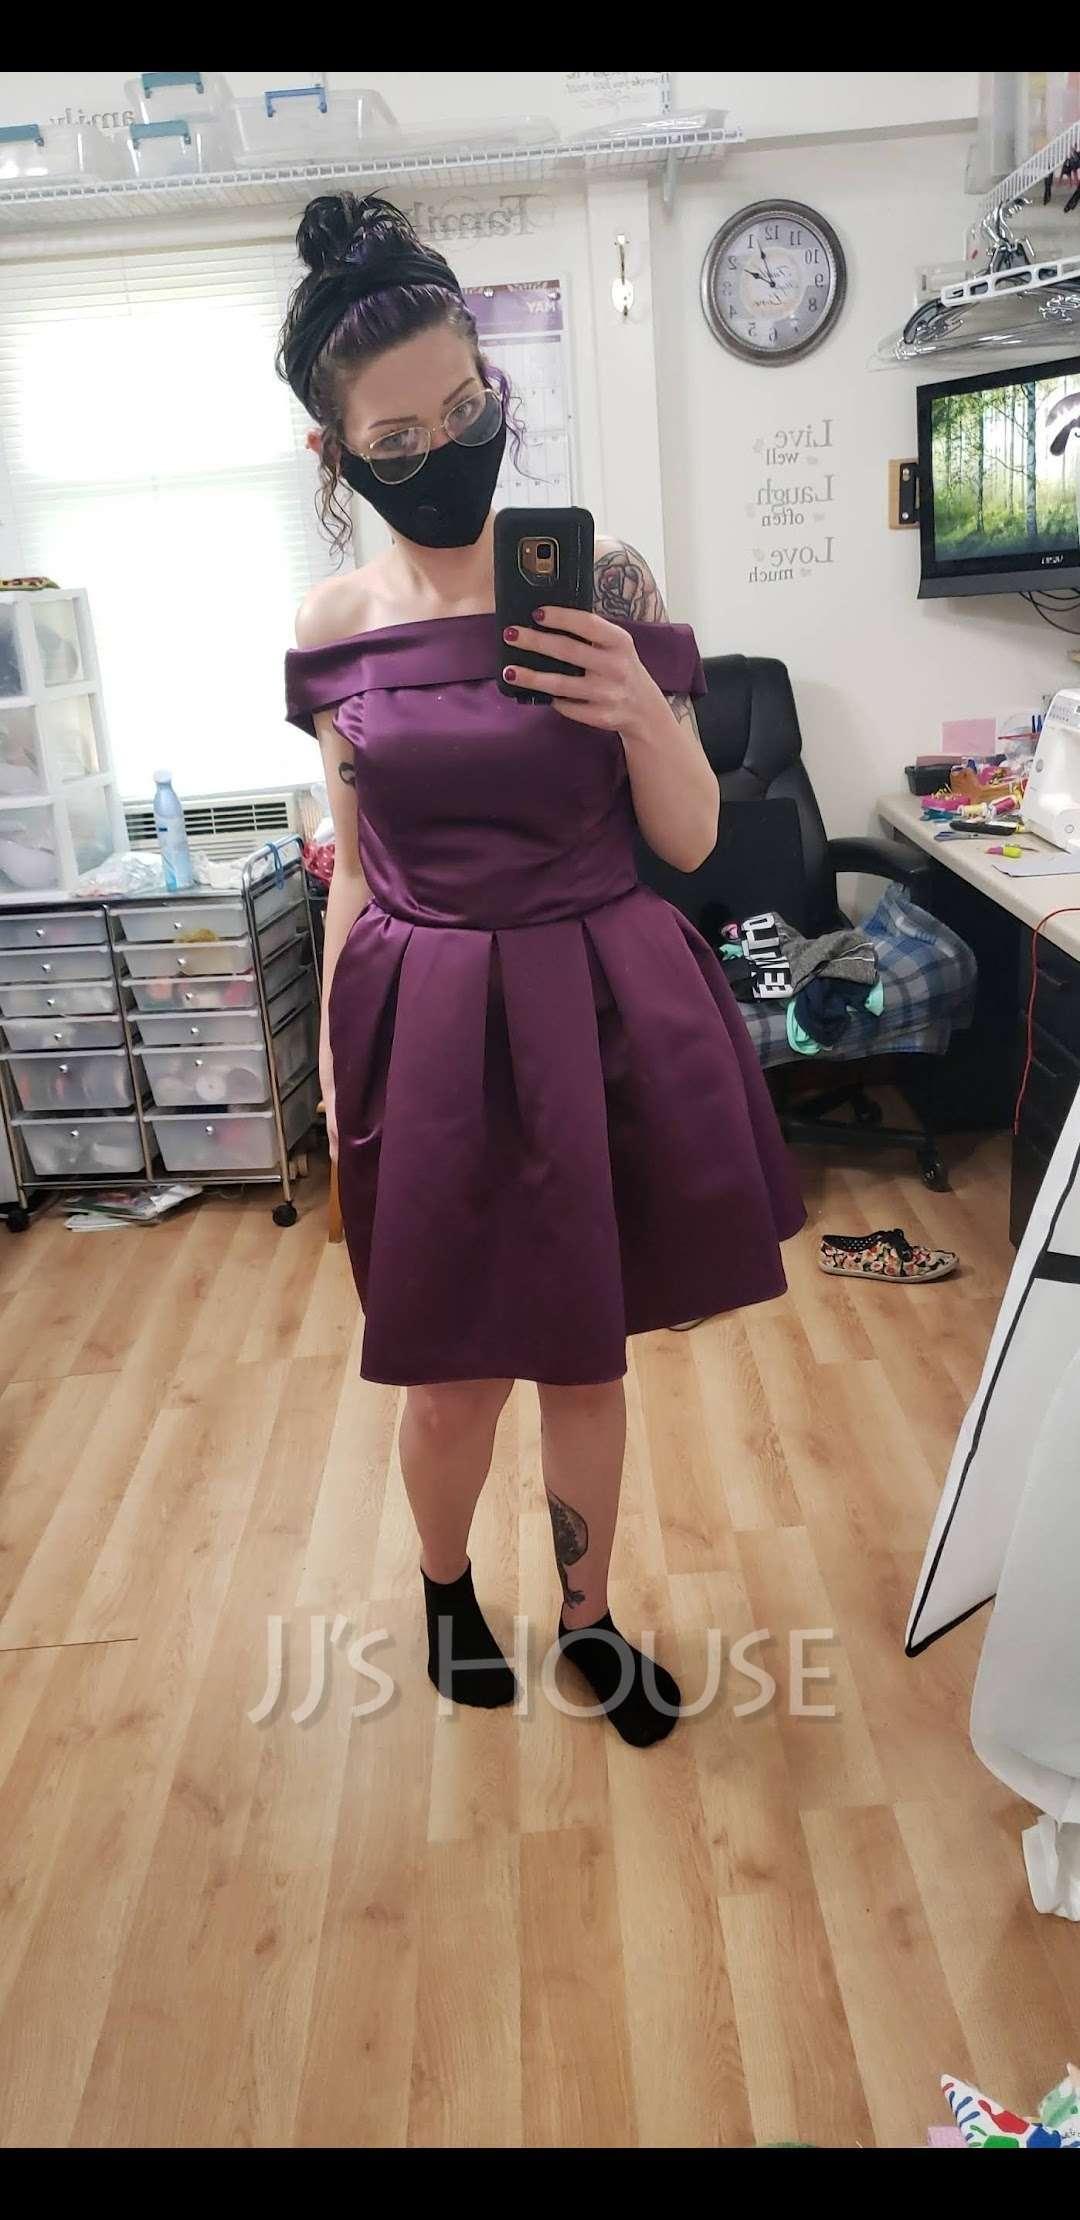 A-Line/Princess Off-the-Shoulder Short/Mini Satin Cocktail Dress